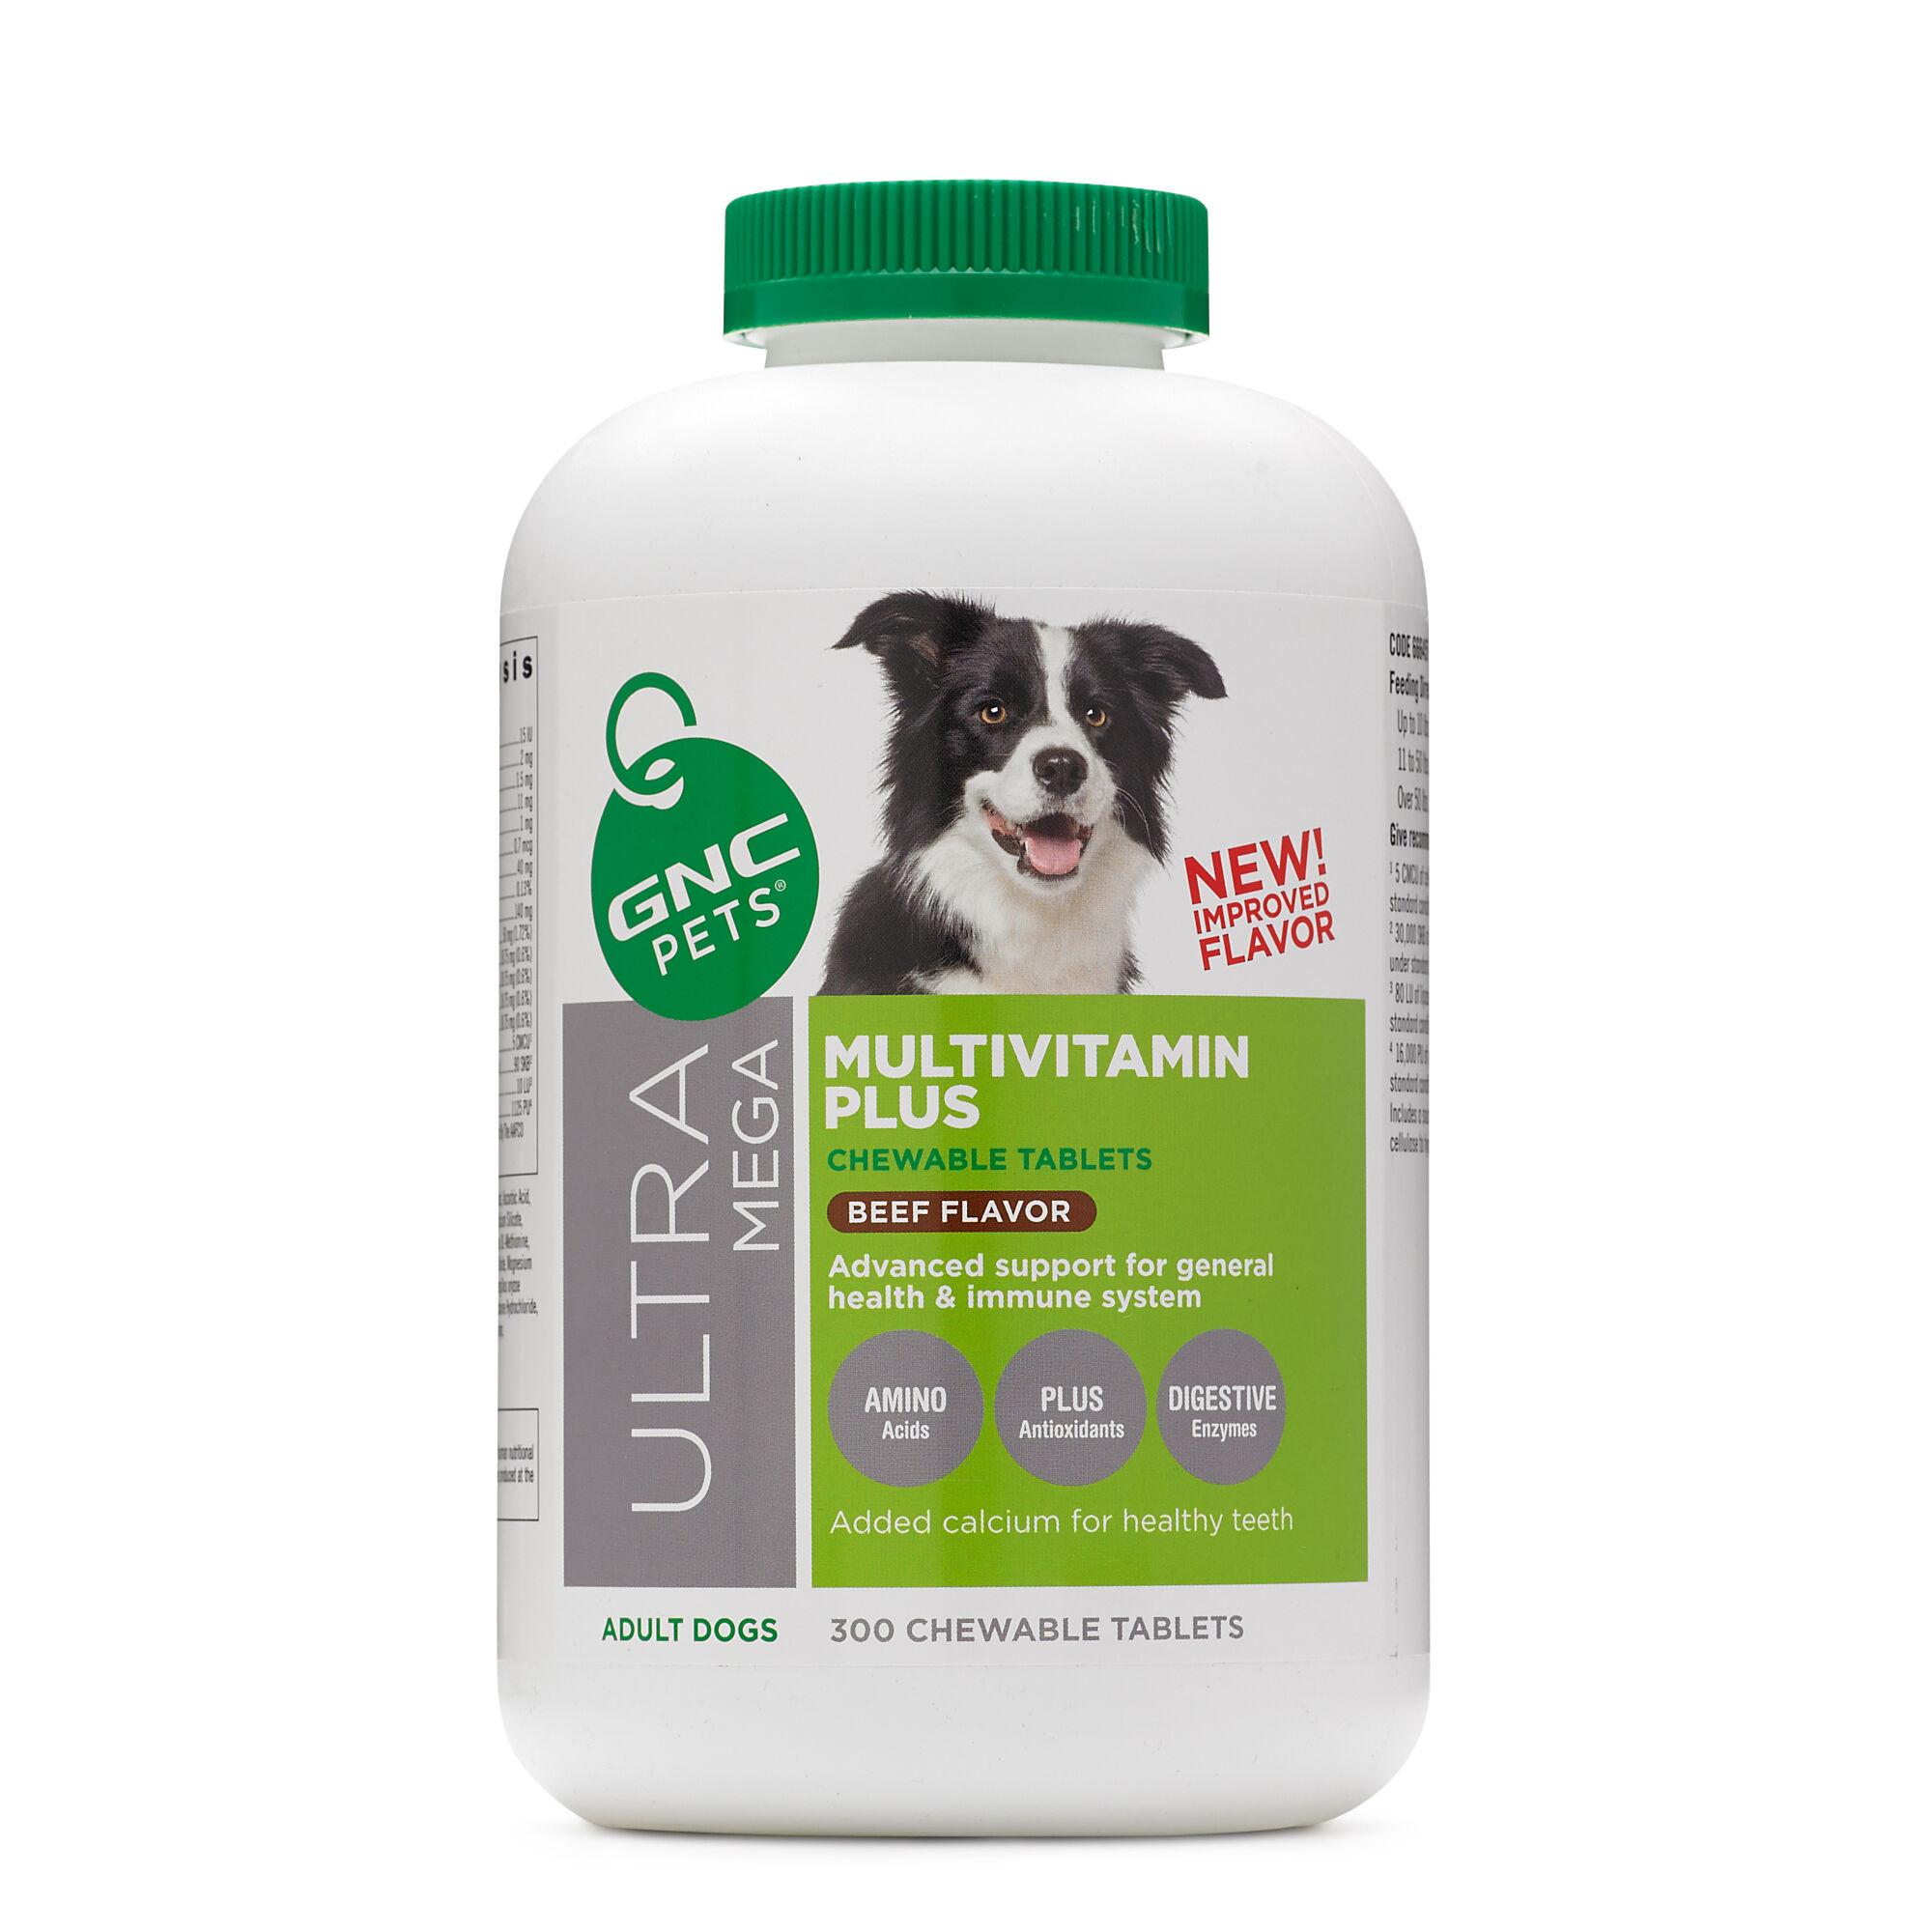 GNC Pets Ultra Mega Multivitamin Plus - Adult Dogs - Beef Flavor